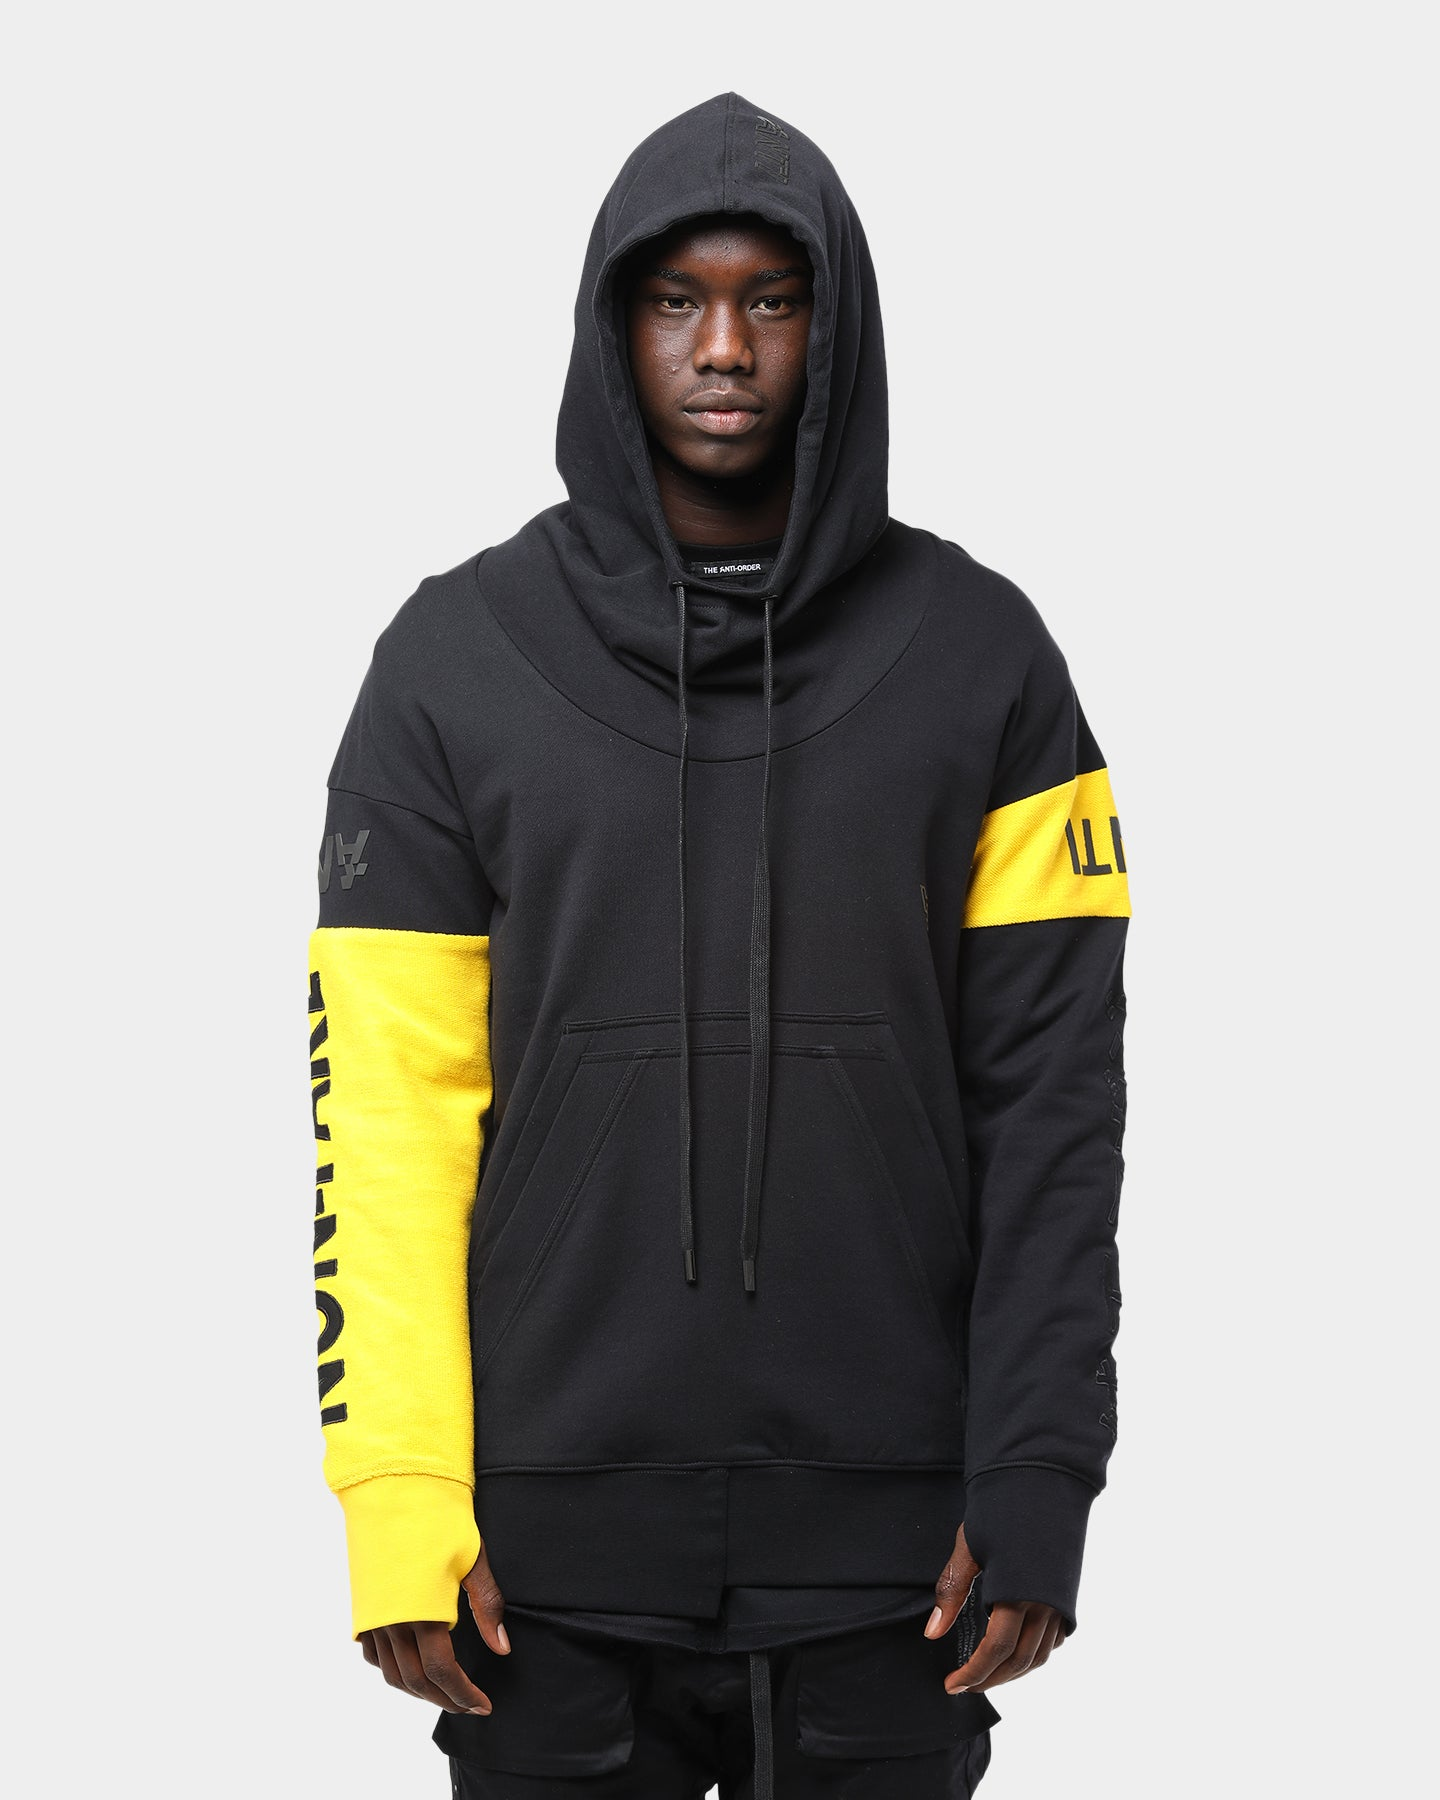 Adidas Athletics Pack Fleece Fullzip Hoodie Legacy Green Yellow Tint Black Kids